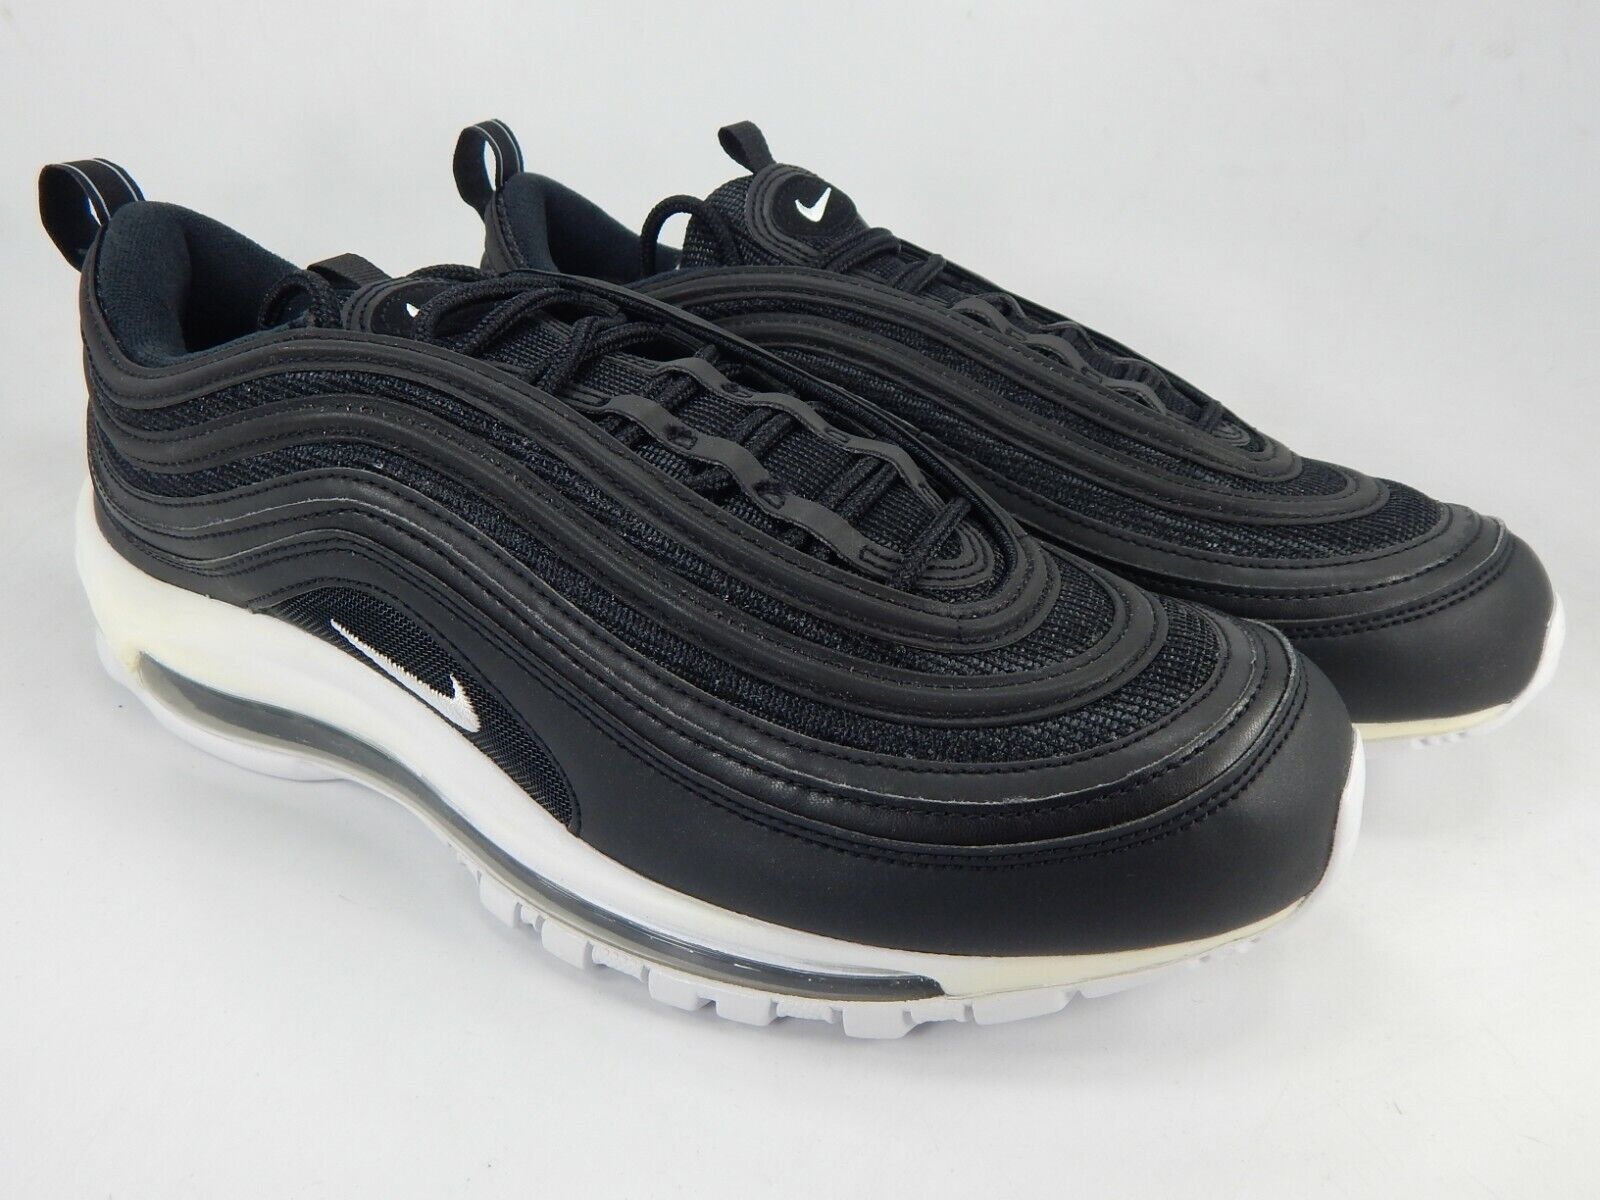 Nike Air Max 97 Size 10 M EU 44 Men's